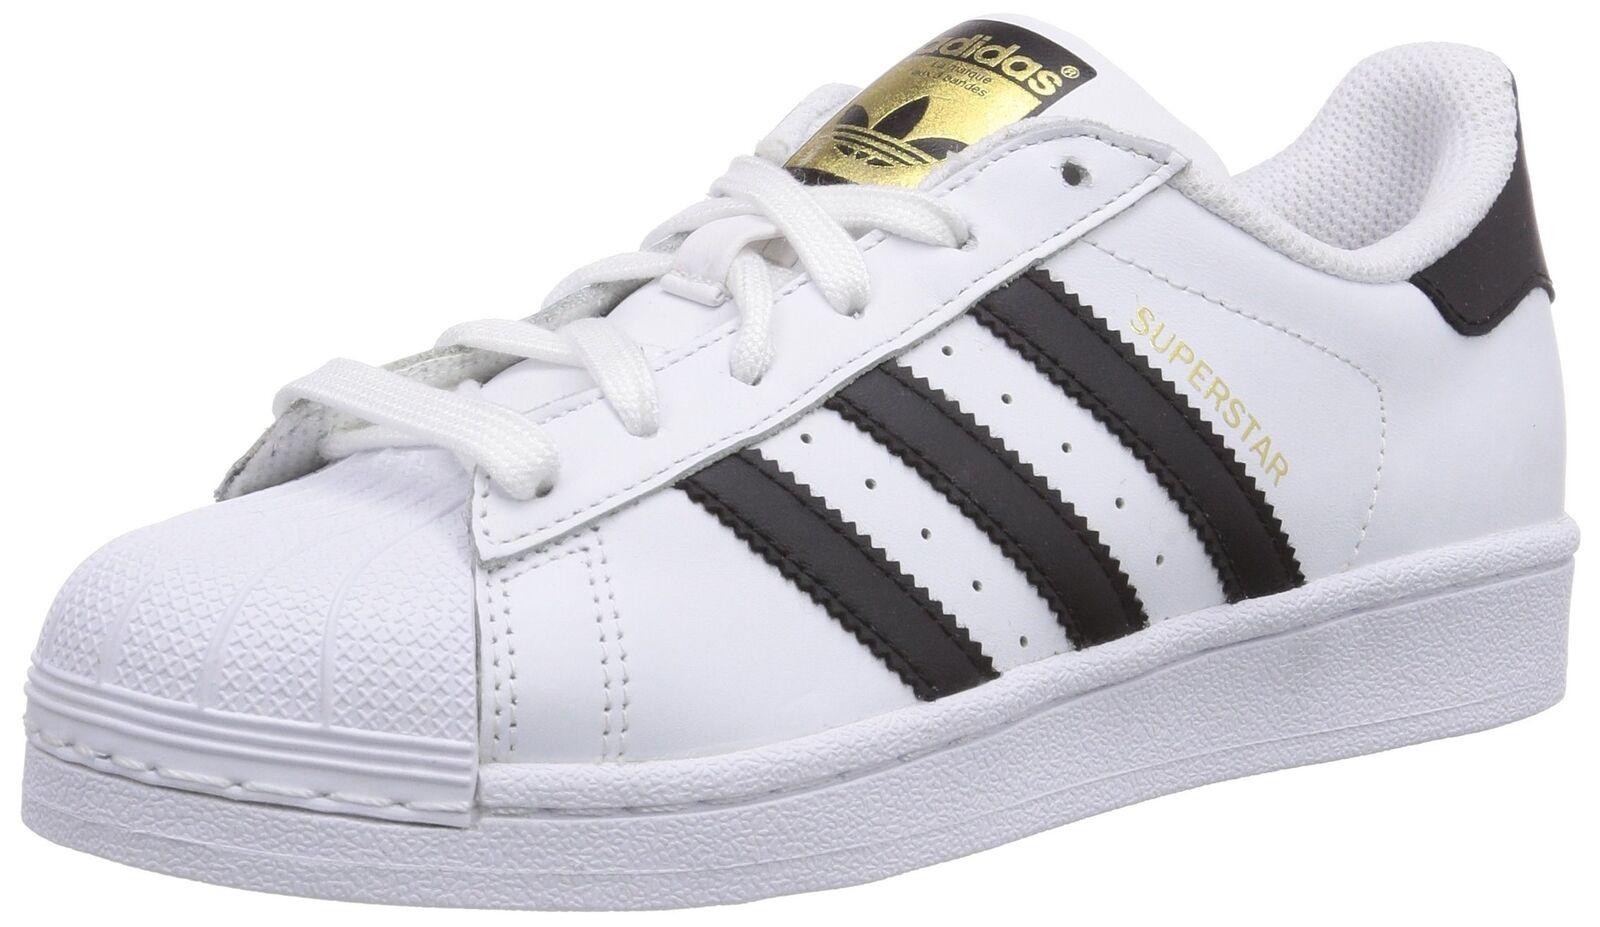 Adidas Originals Men's Superstar Casual Sneaker, White Core Black White, 13 M US